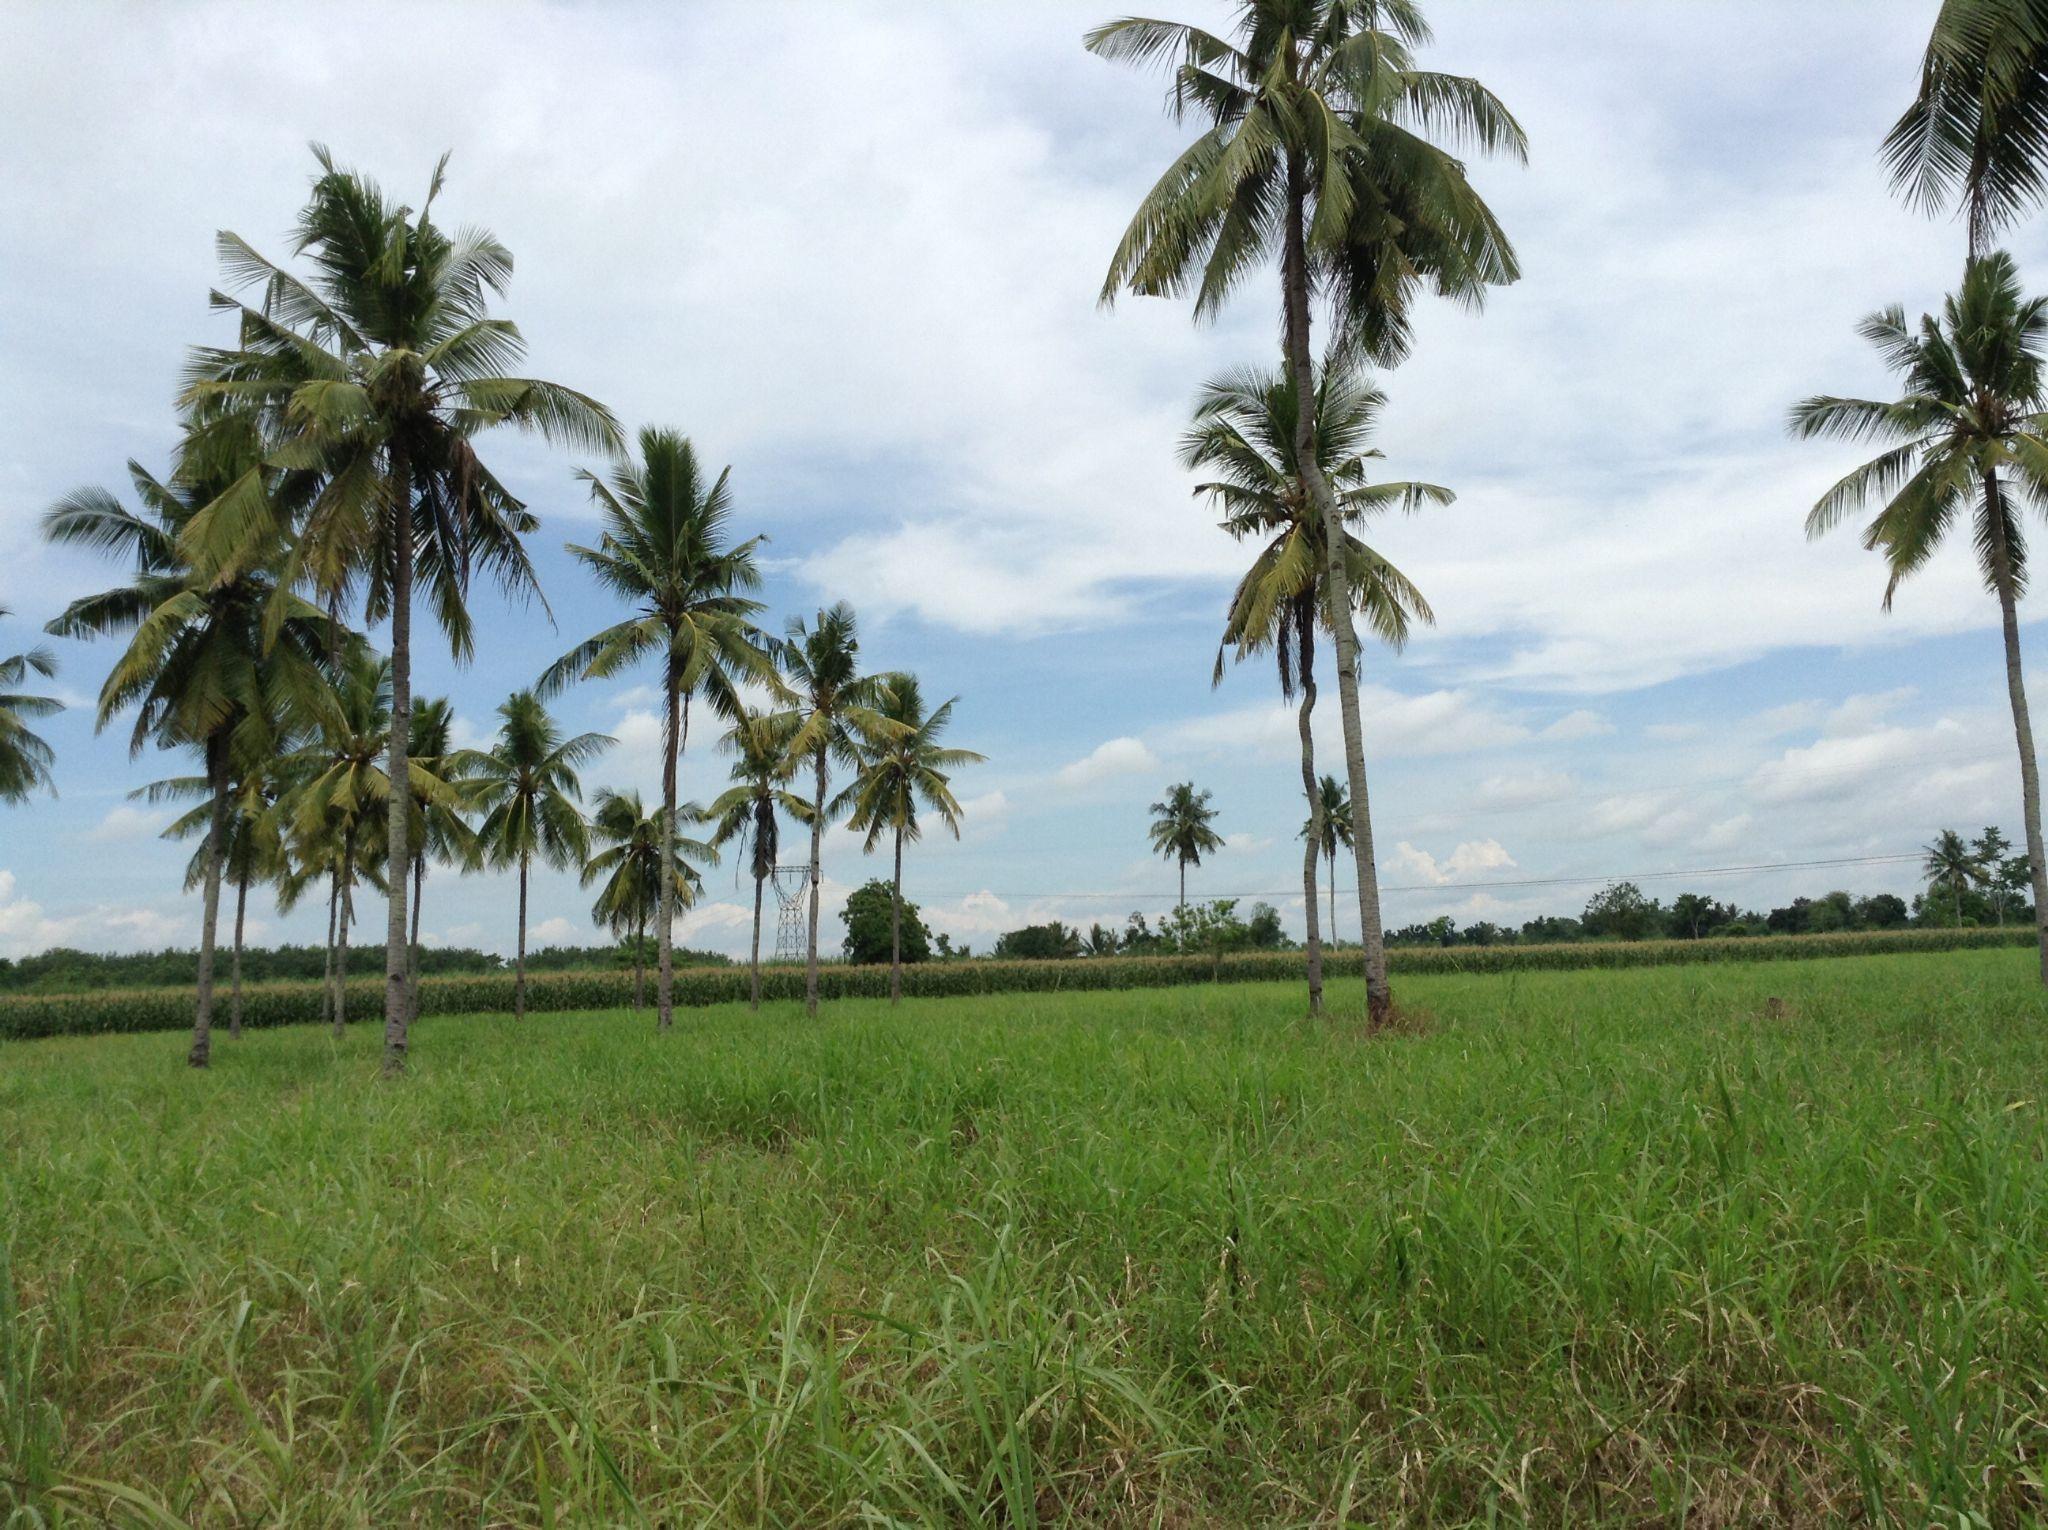 The Farm by beng.tabilla